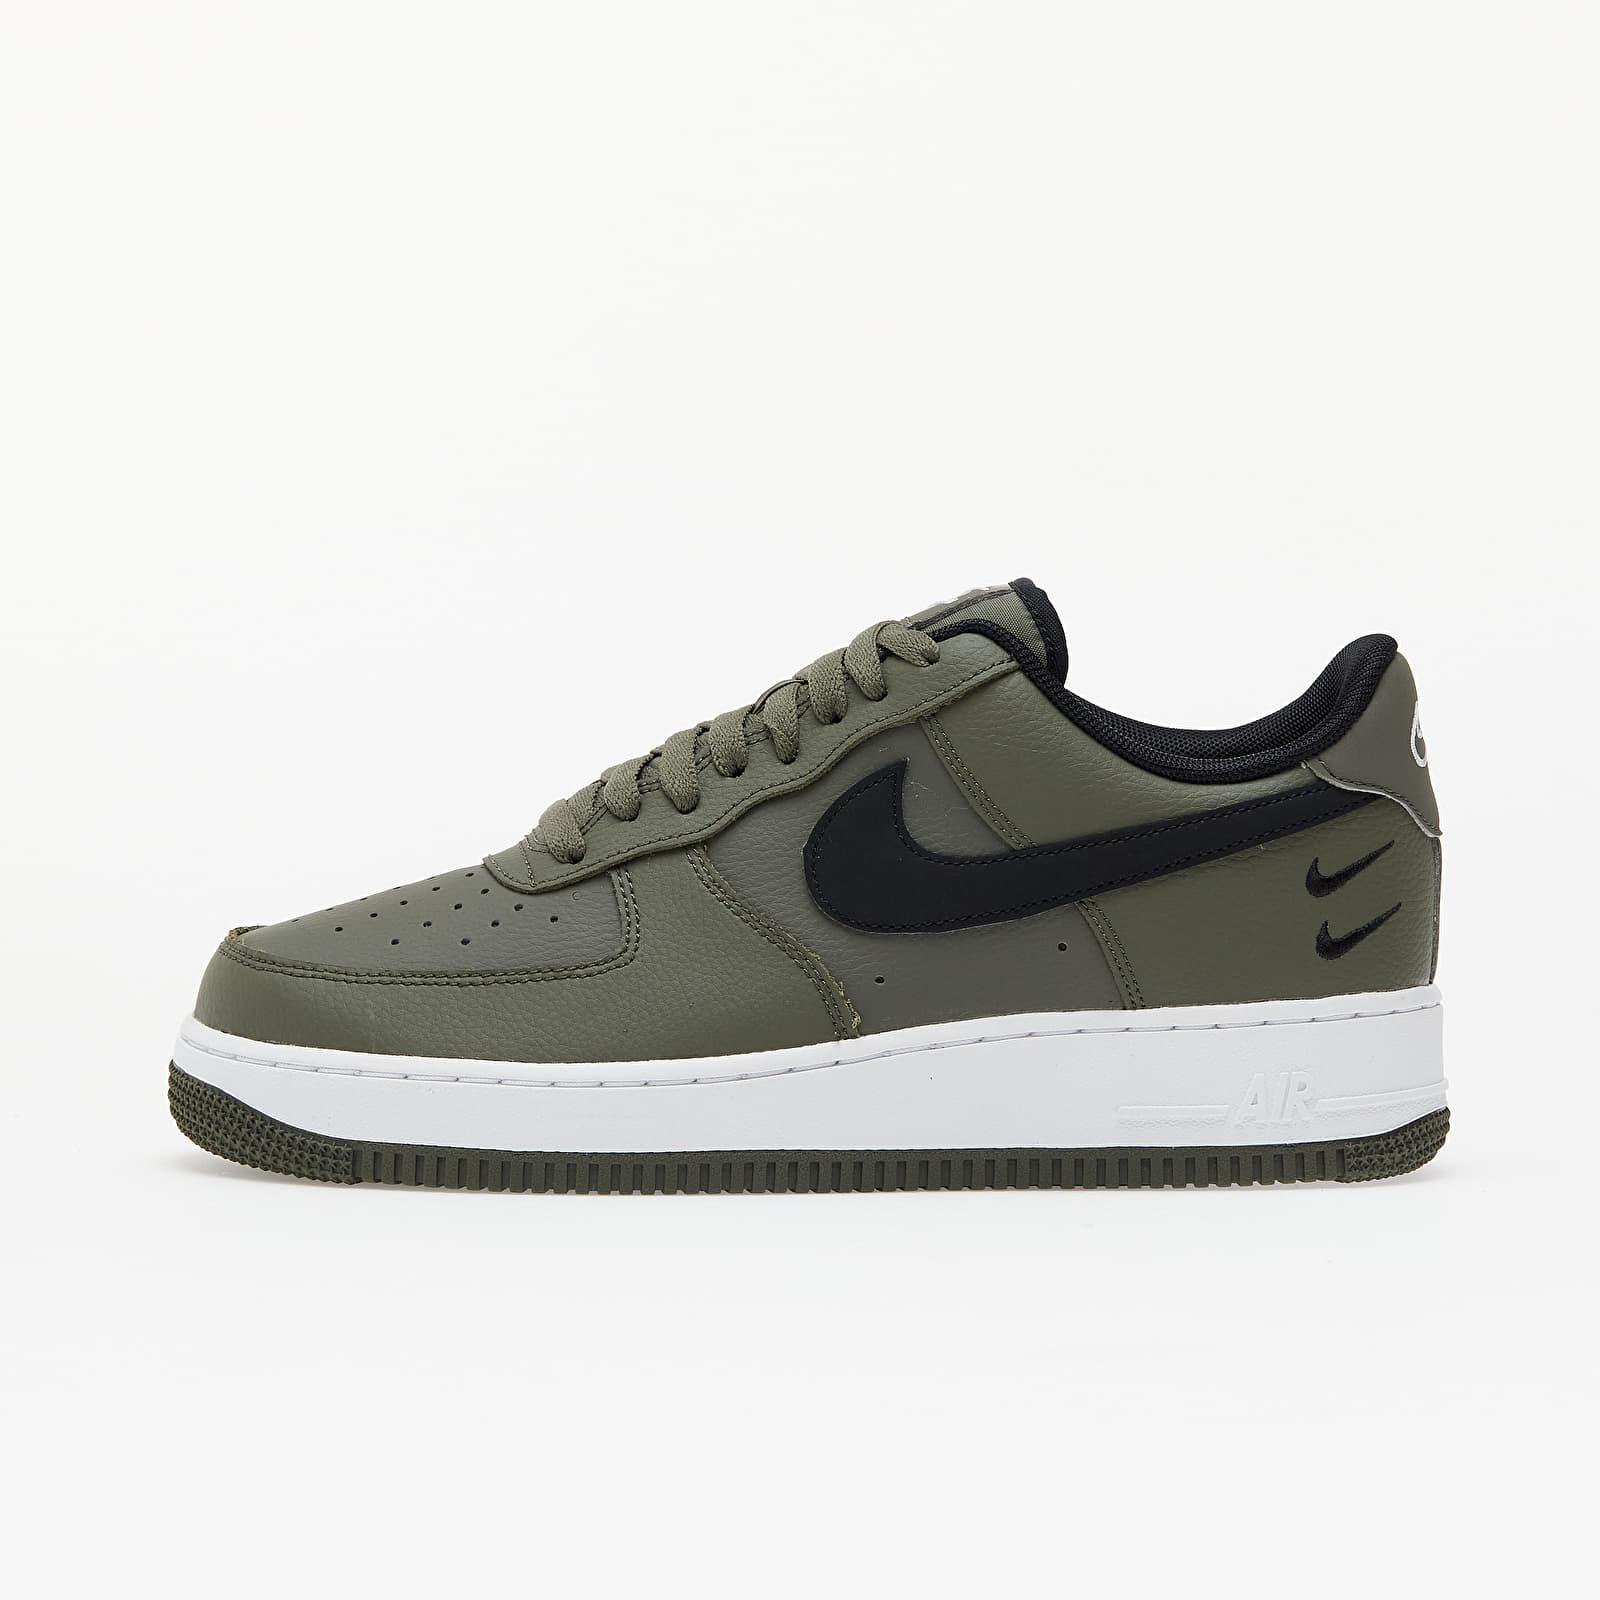 Pánske tenisky a topánky Nike Air Force 1 '07 Twilight Marsh/ Black-White